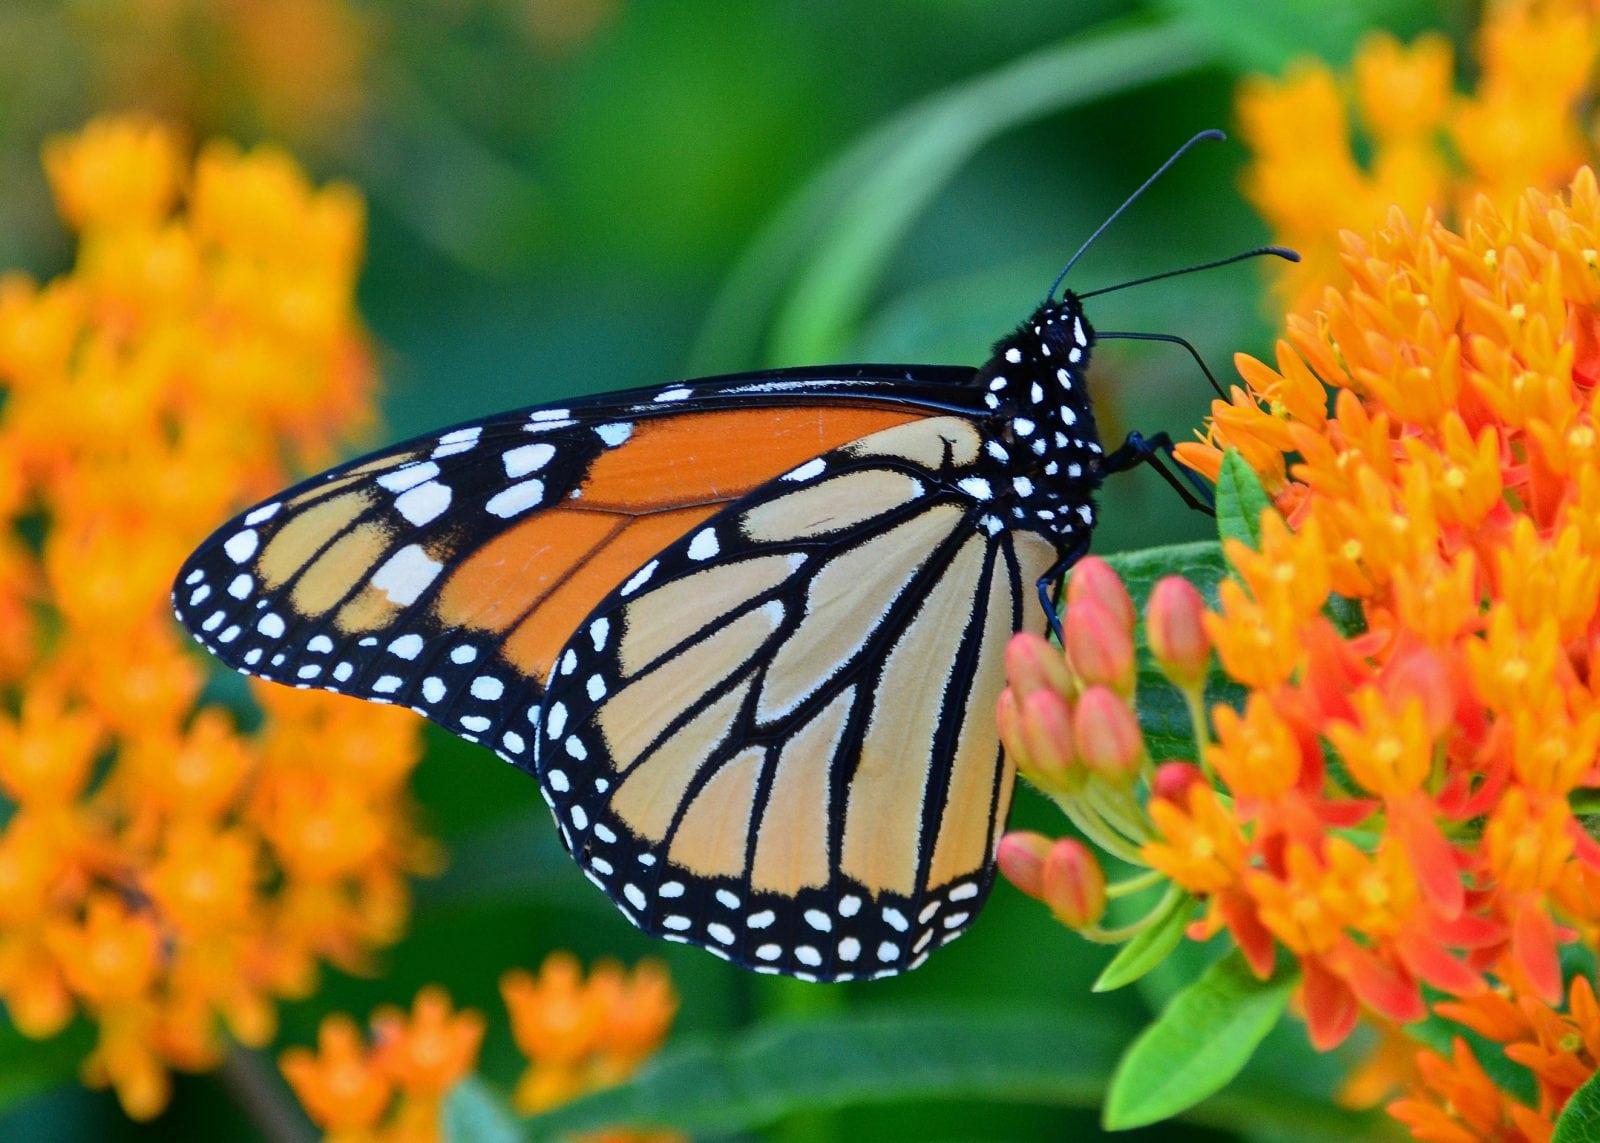 Plants That Attract Butterflies Caseys Outdoor Solutions & Florist